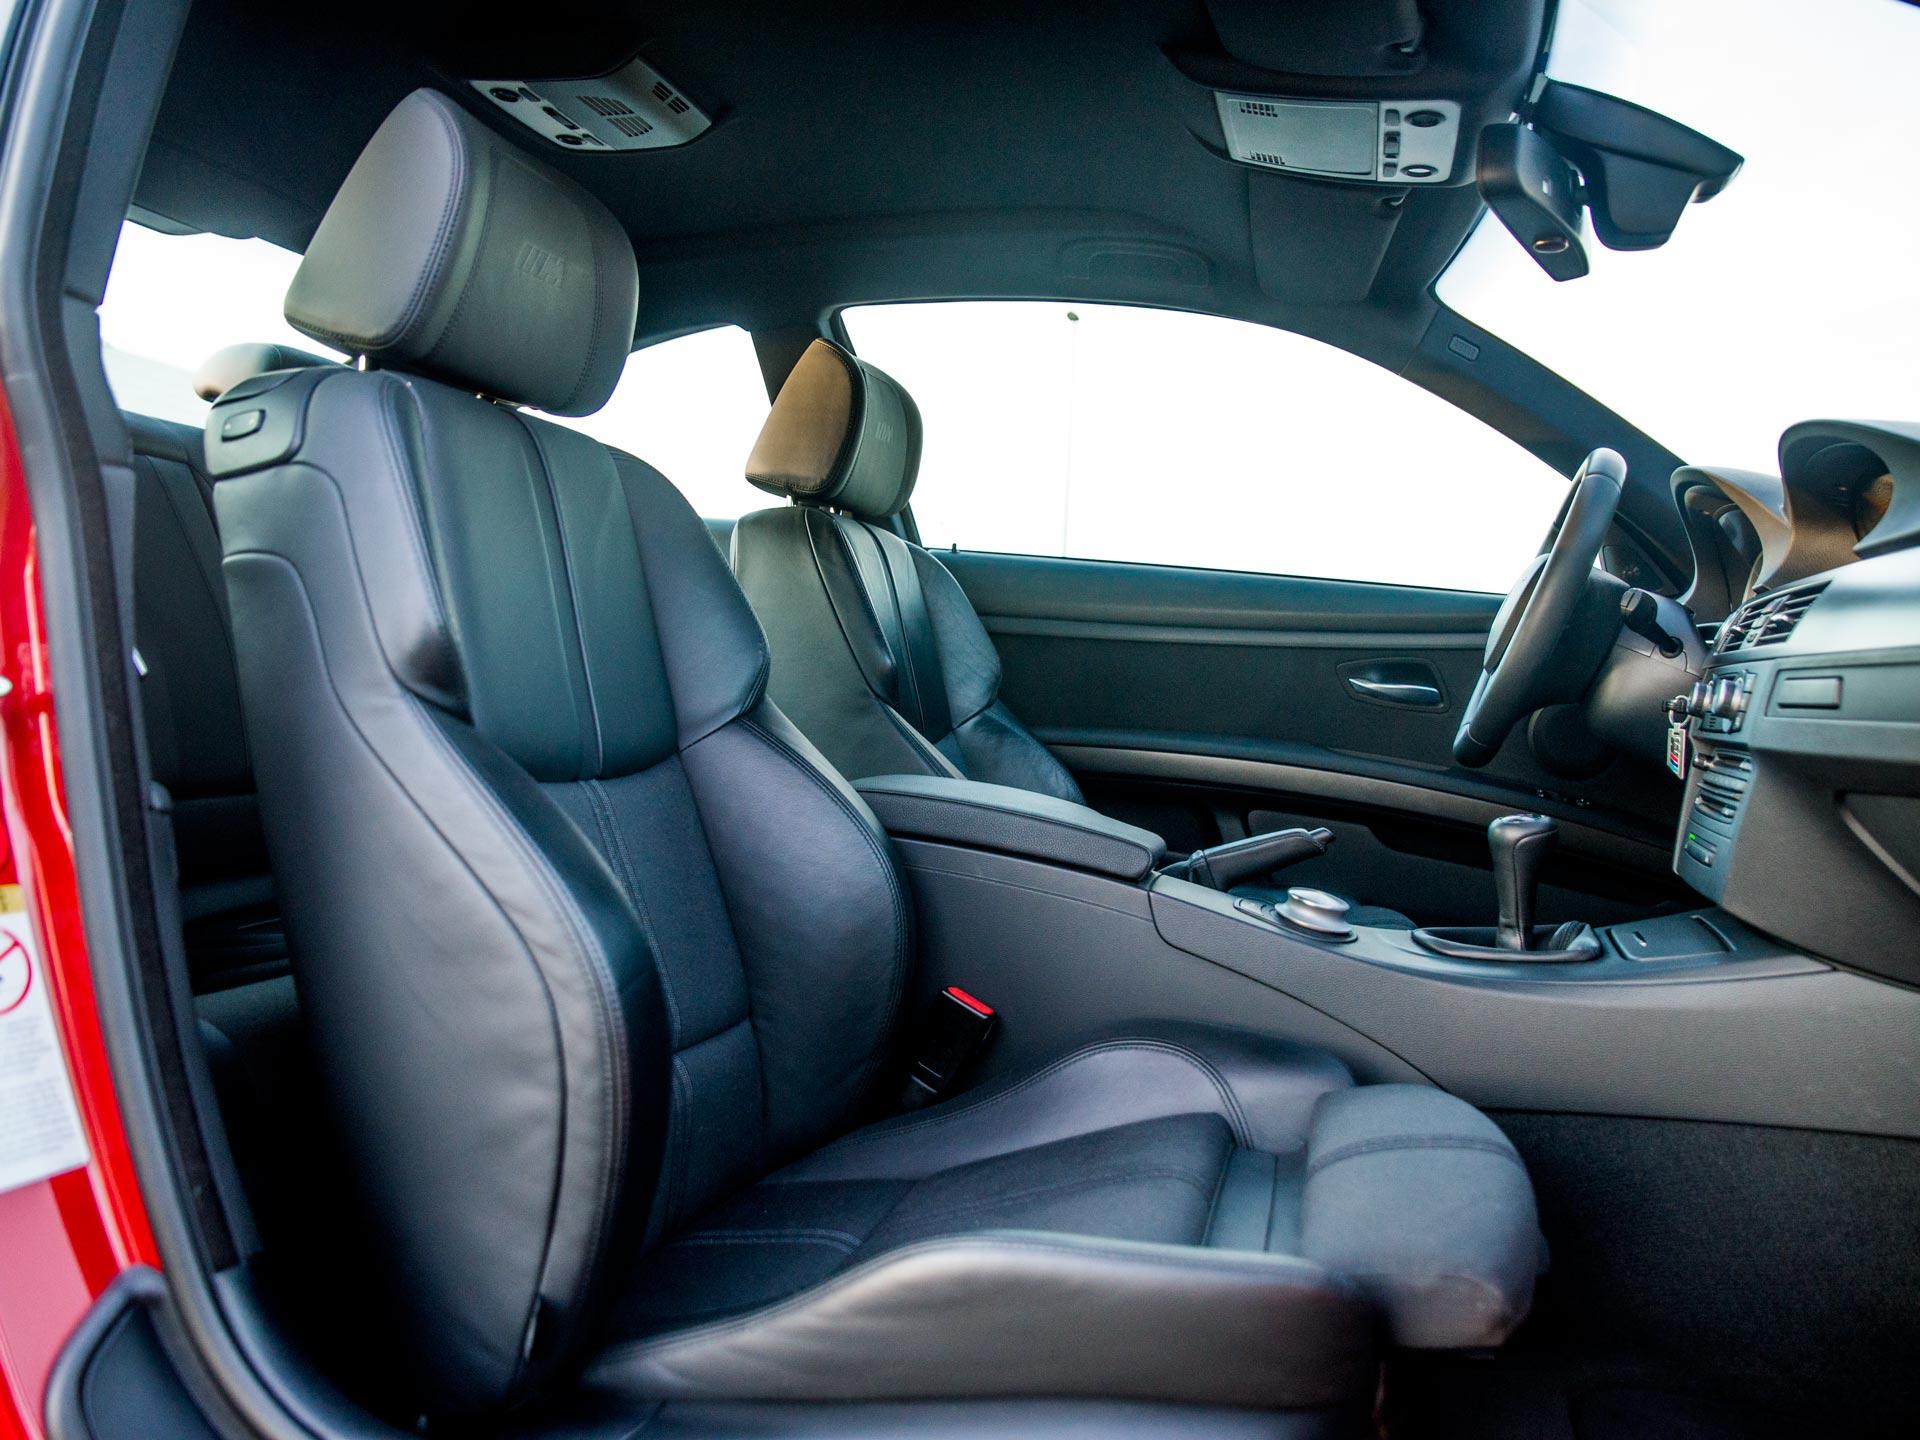 Tweedehands BMW M3 Coupé occasion